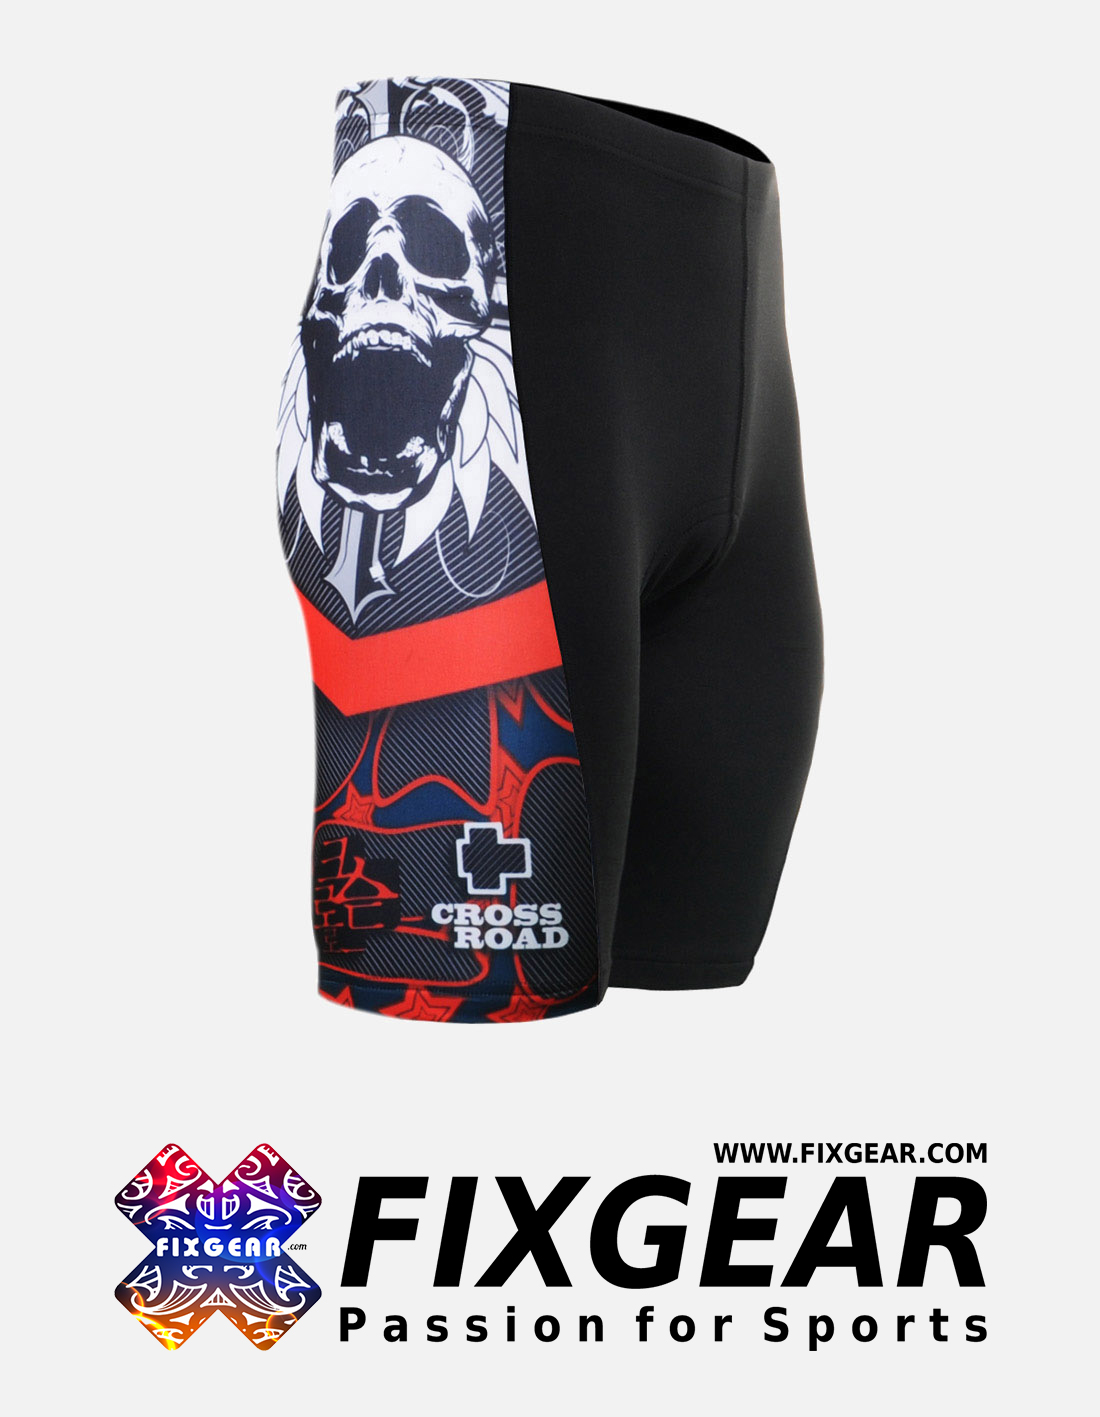 FIXGEAR ST-W11 Women's Cycling Padded Shorts